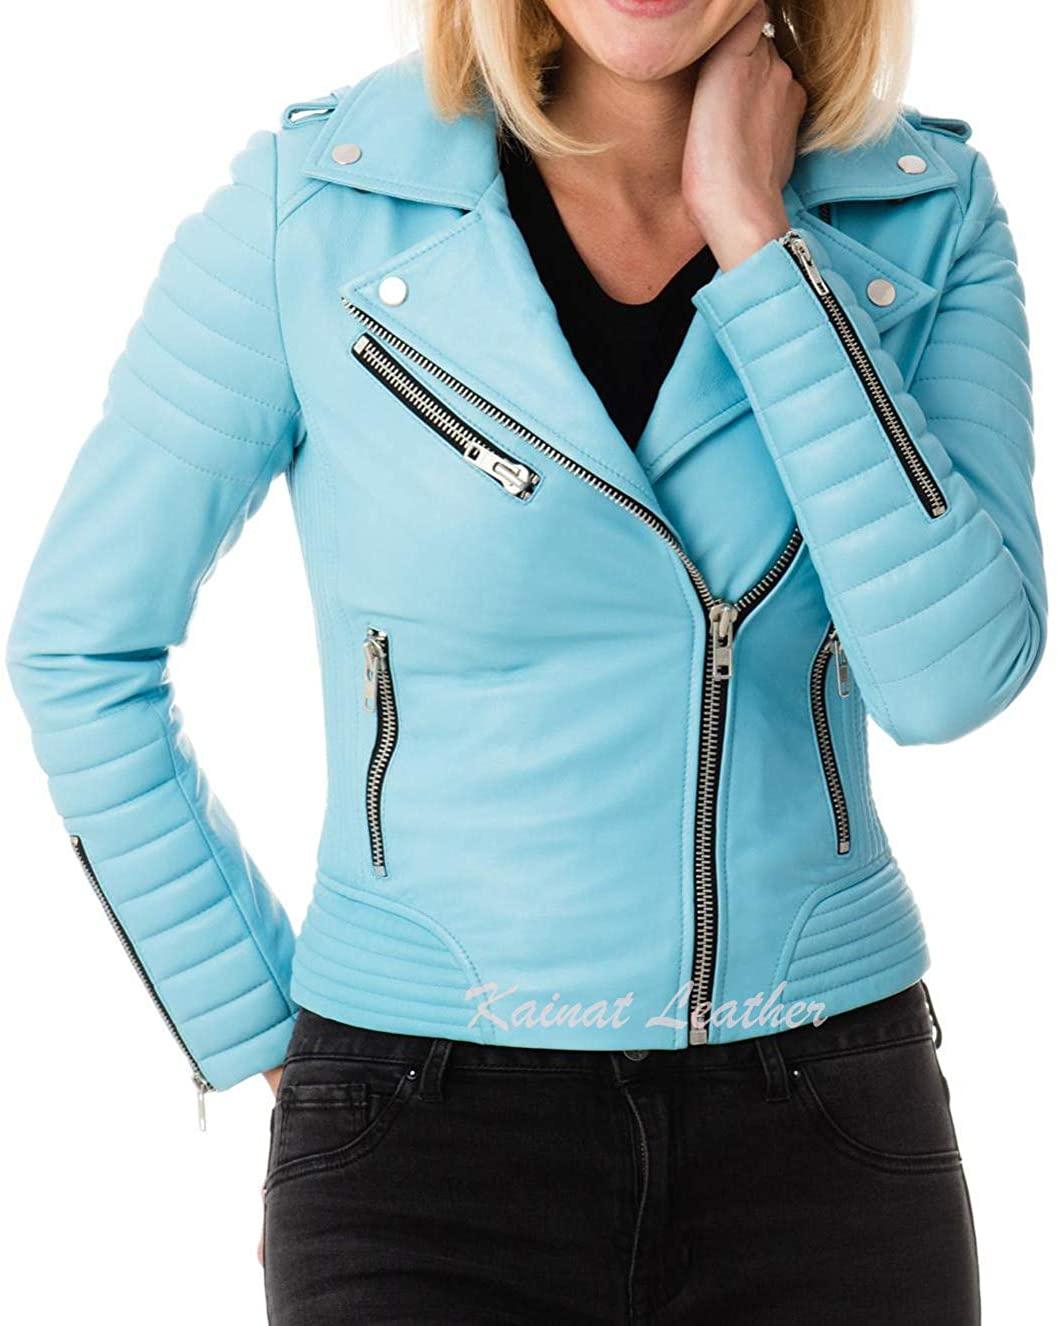 KAINAT Women's Lambskin Leather Craft Bomber Biker Jacket 18